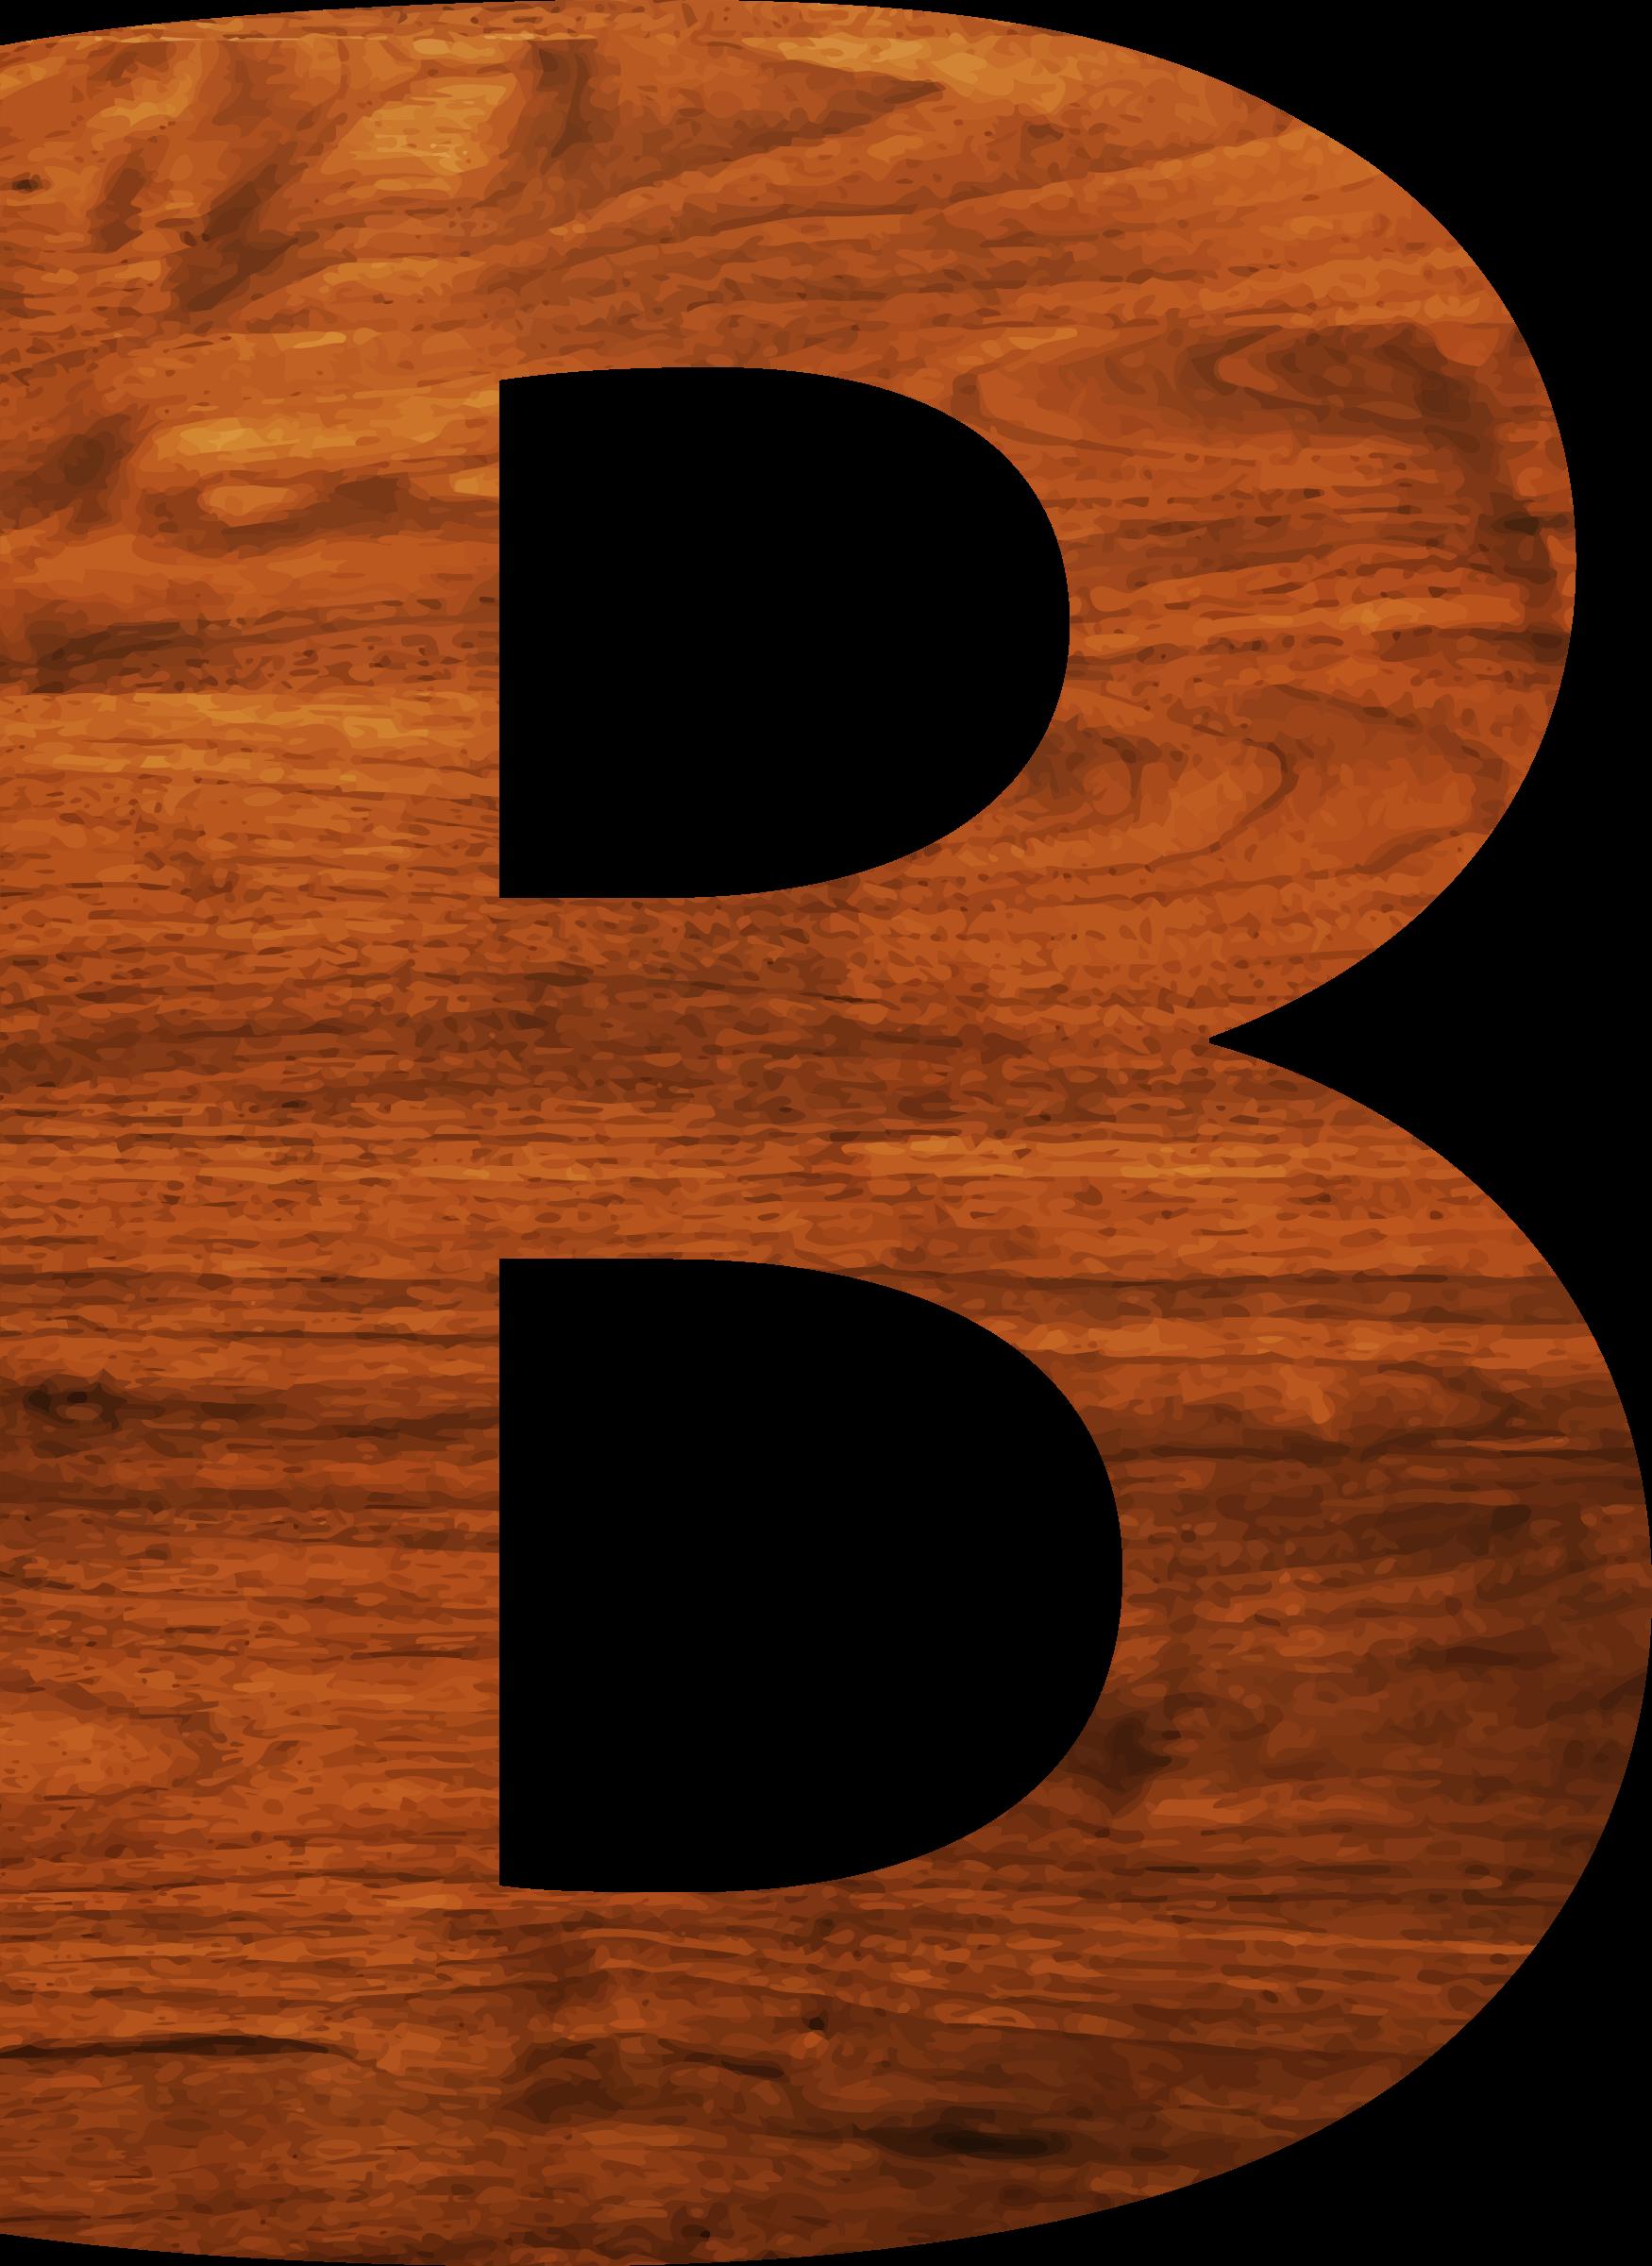 B clipart wood. Texture alphabet big image